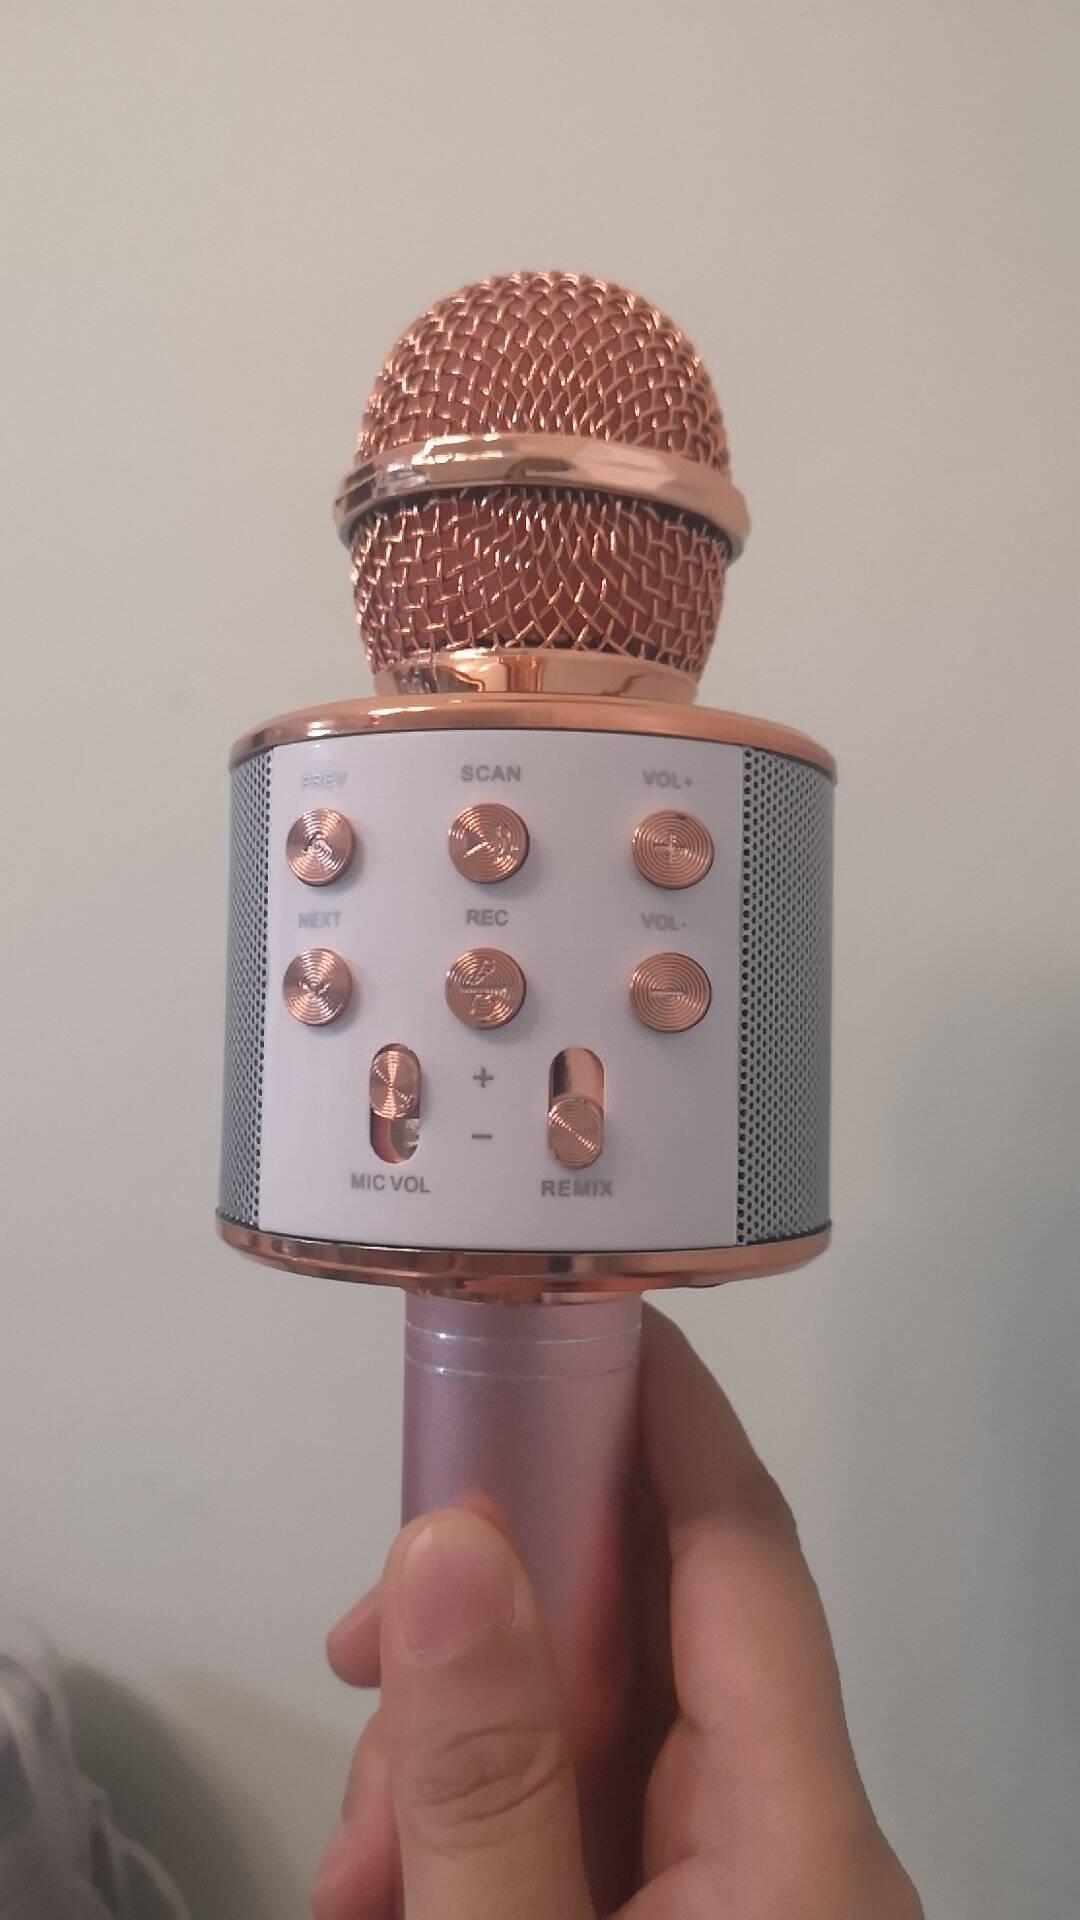 e之音WS858手机儿童麦克风音响话筒一体K歌华为苹果手机k歌宝无线蓝牙麦克风变音器WS858玫瑰金